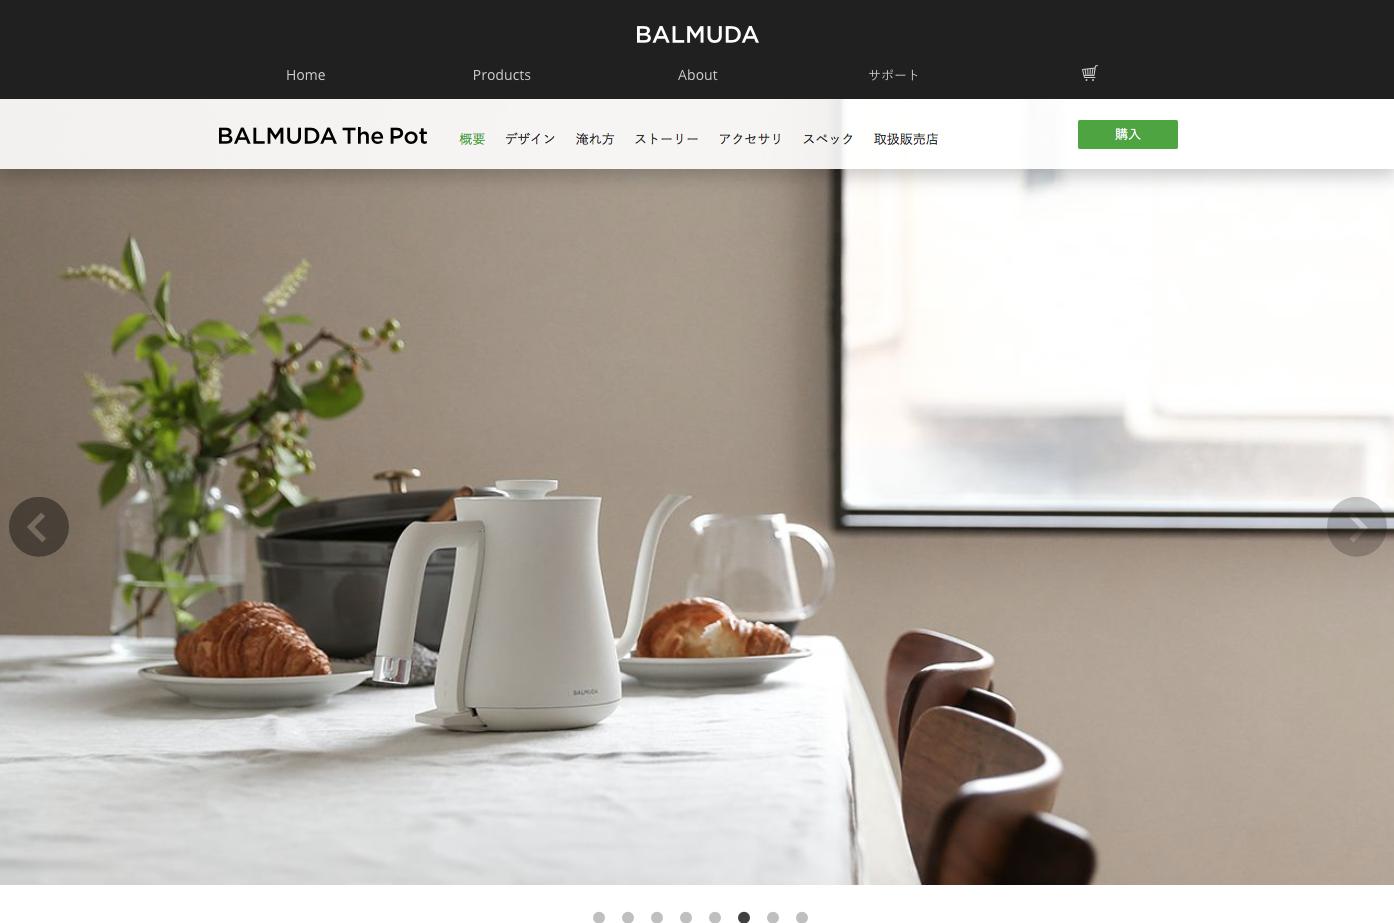 BALMUDAのウェブサイト